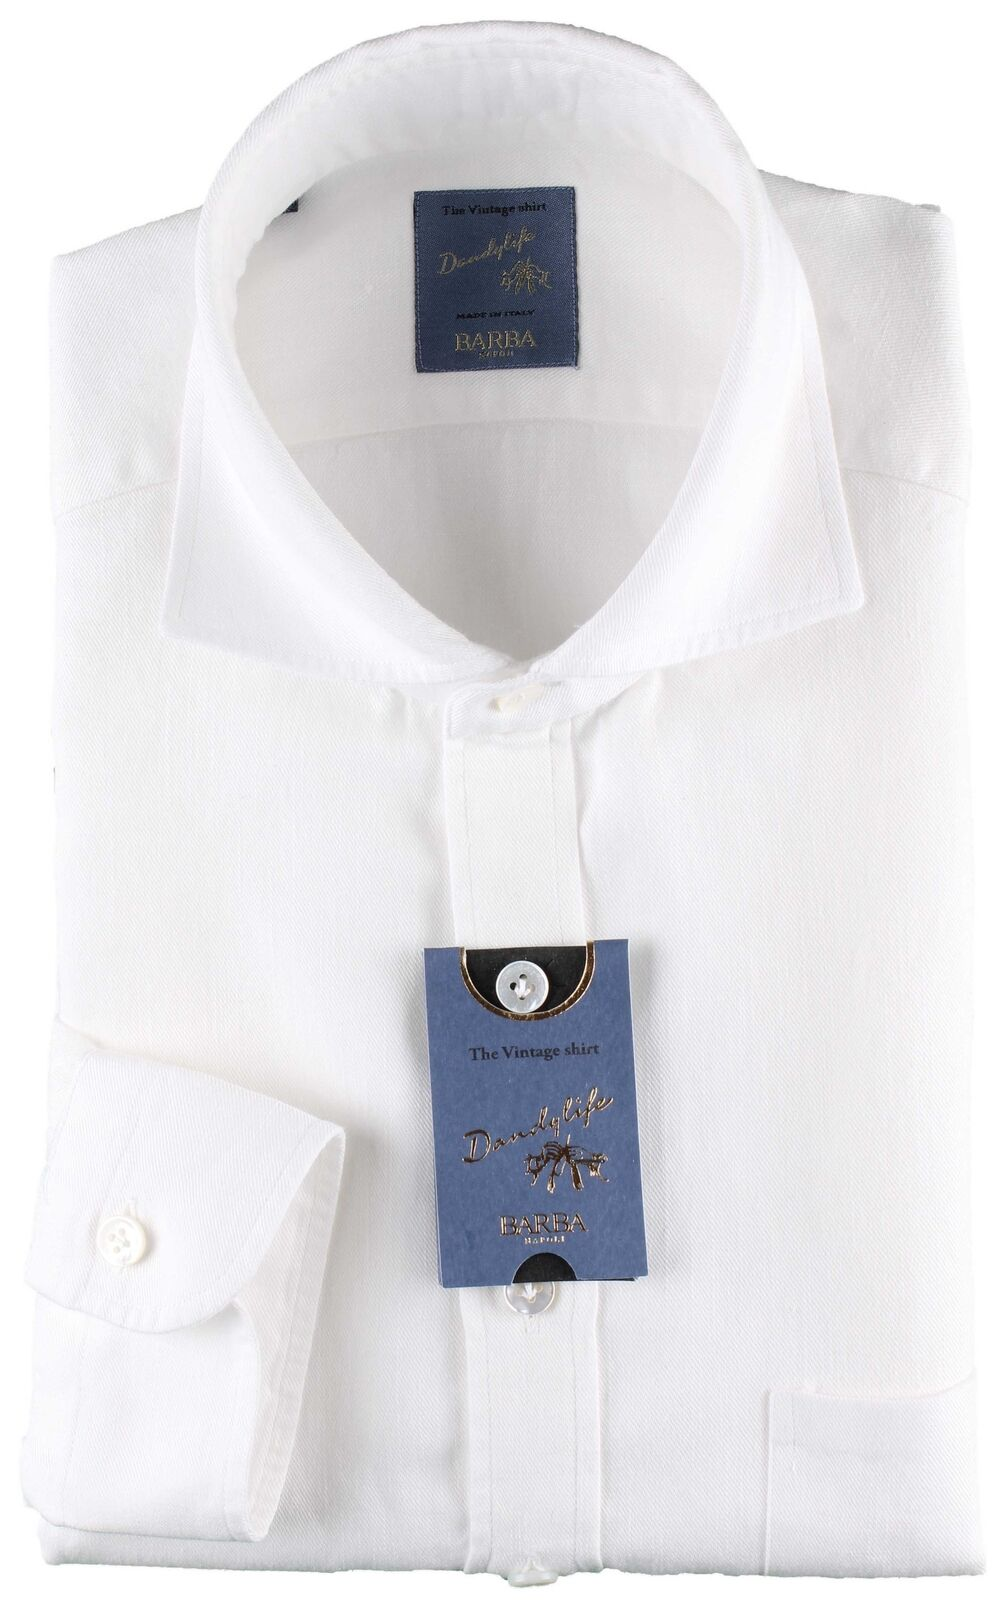 NWT BARBA NAPOLI POLO SHIRT dandy life 1 2 button Weiß handmade 38 15